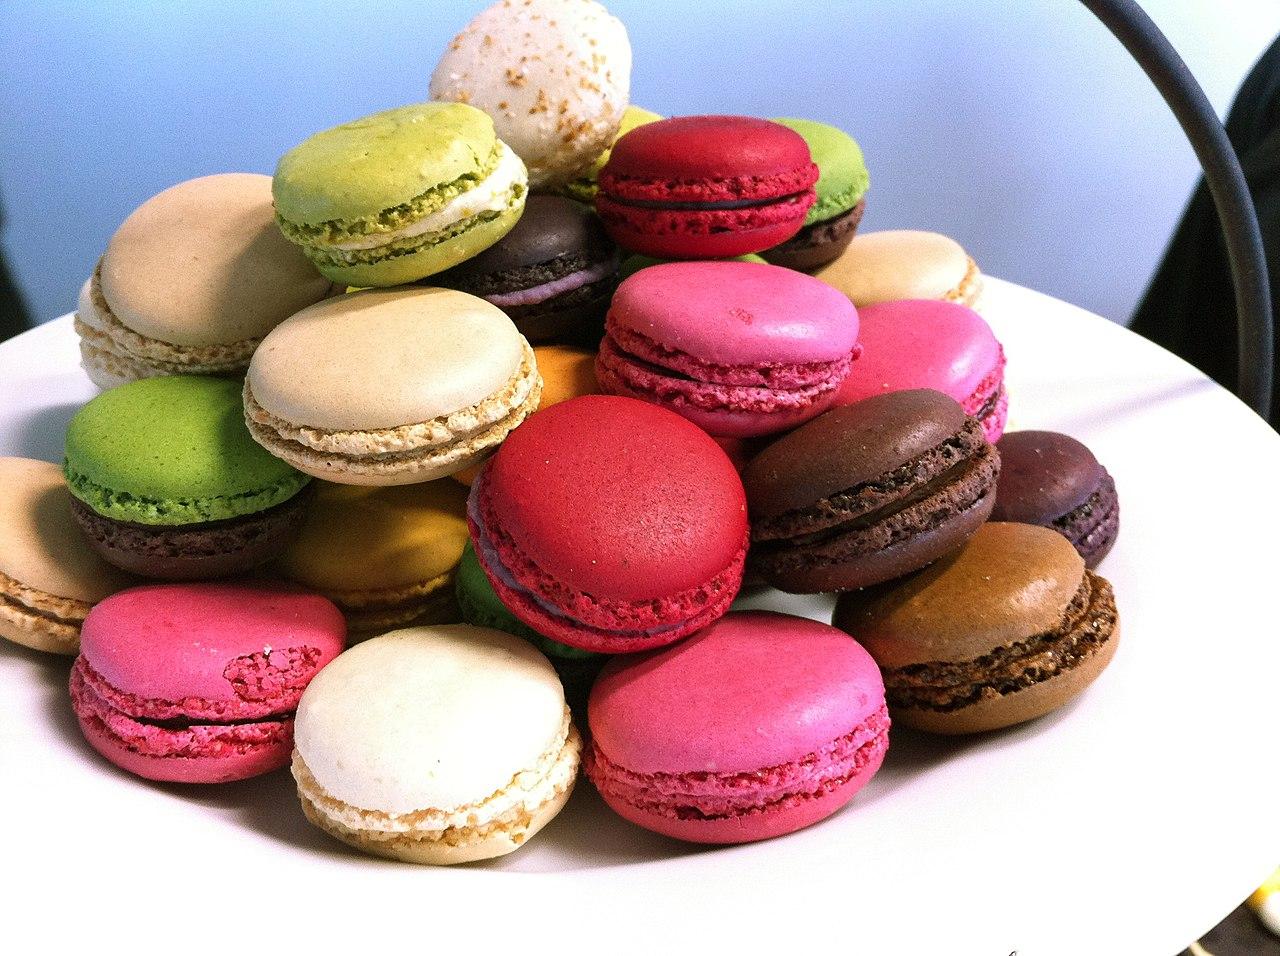 File:Macarons, French made mini cakes.JPG